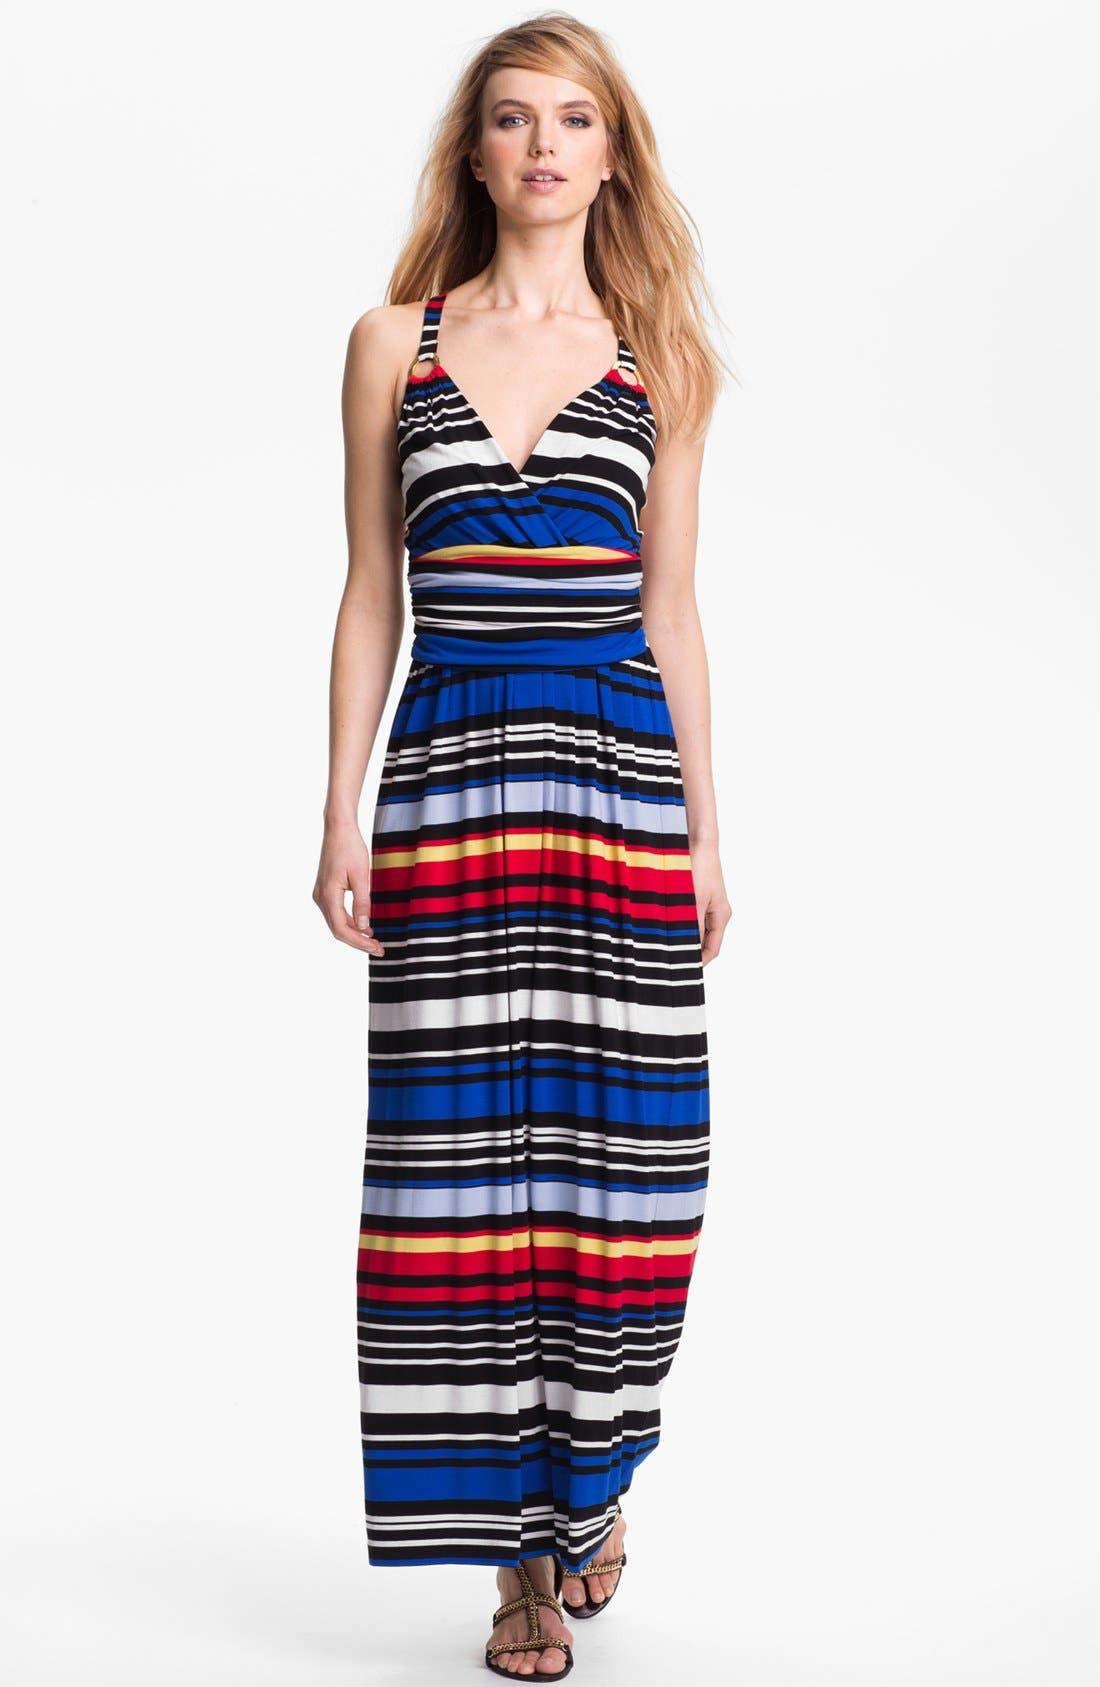 Alternate Image 1 Selected - Vince Camuto Bright Stripe Halter Maxi Dress